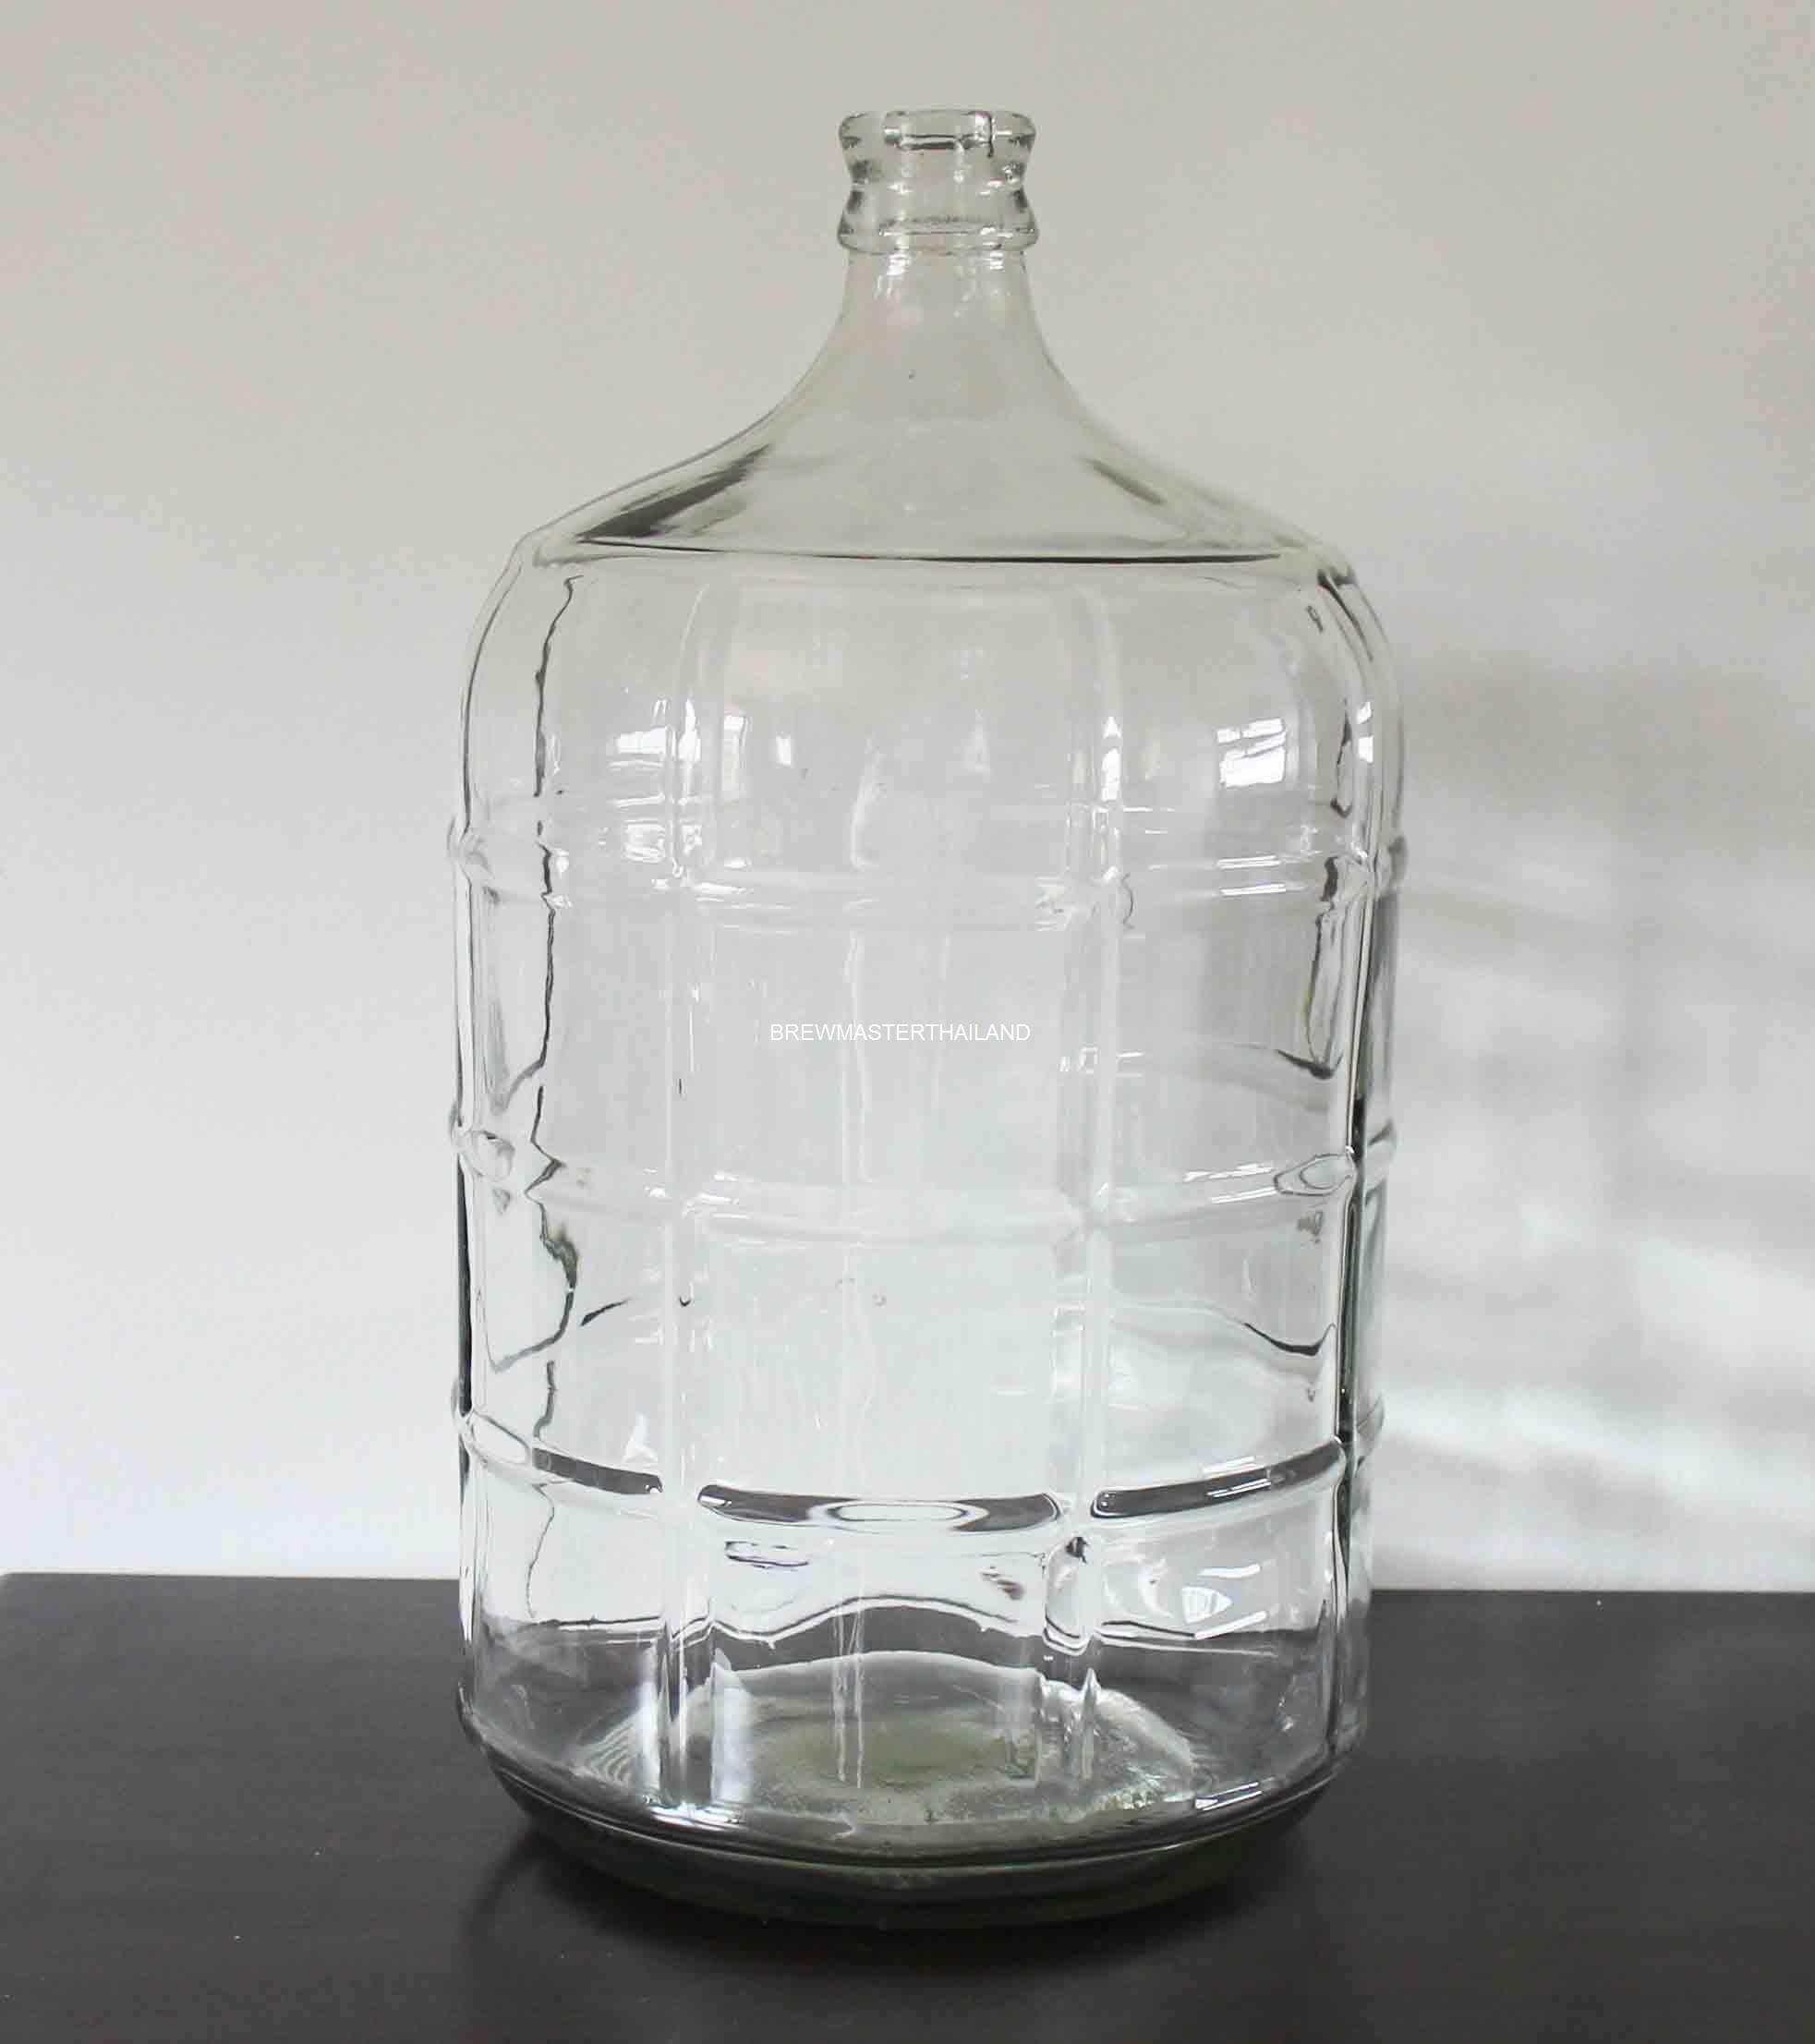 Glass Carboy - 5 Gallon